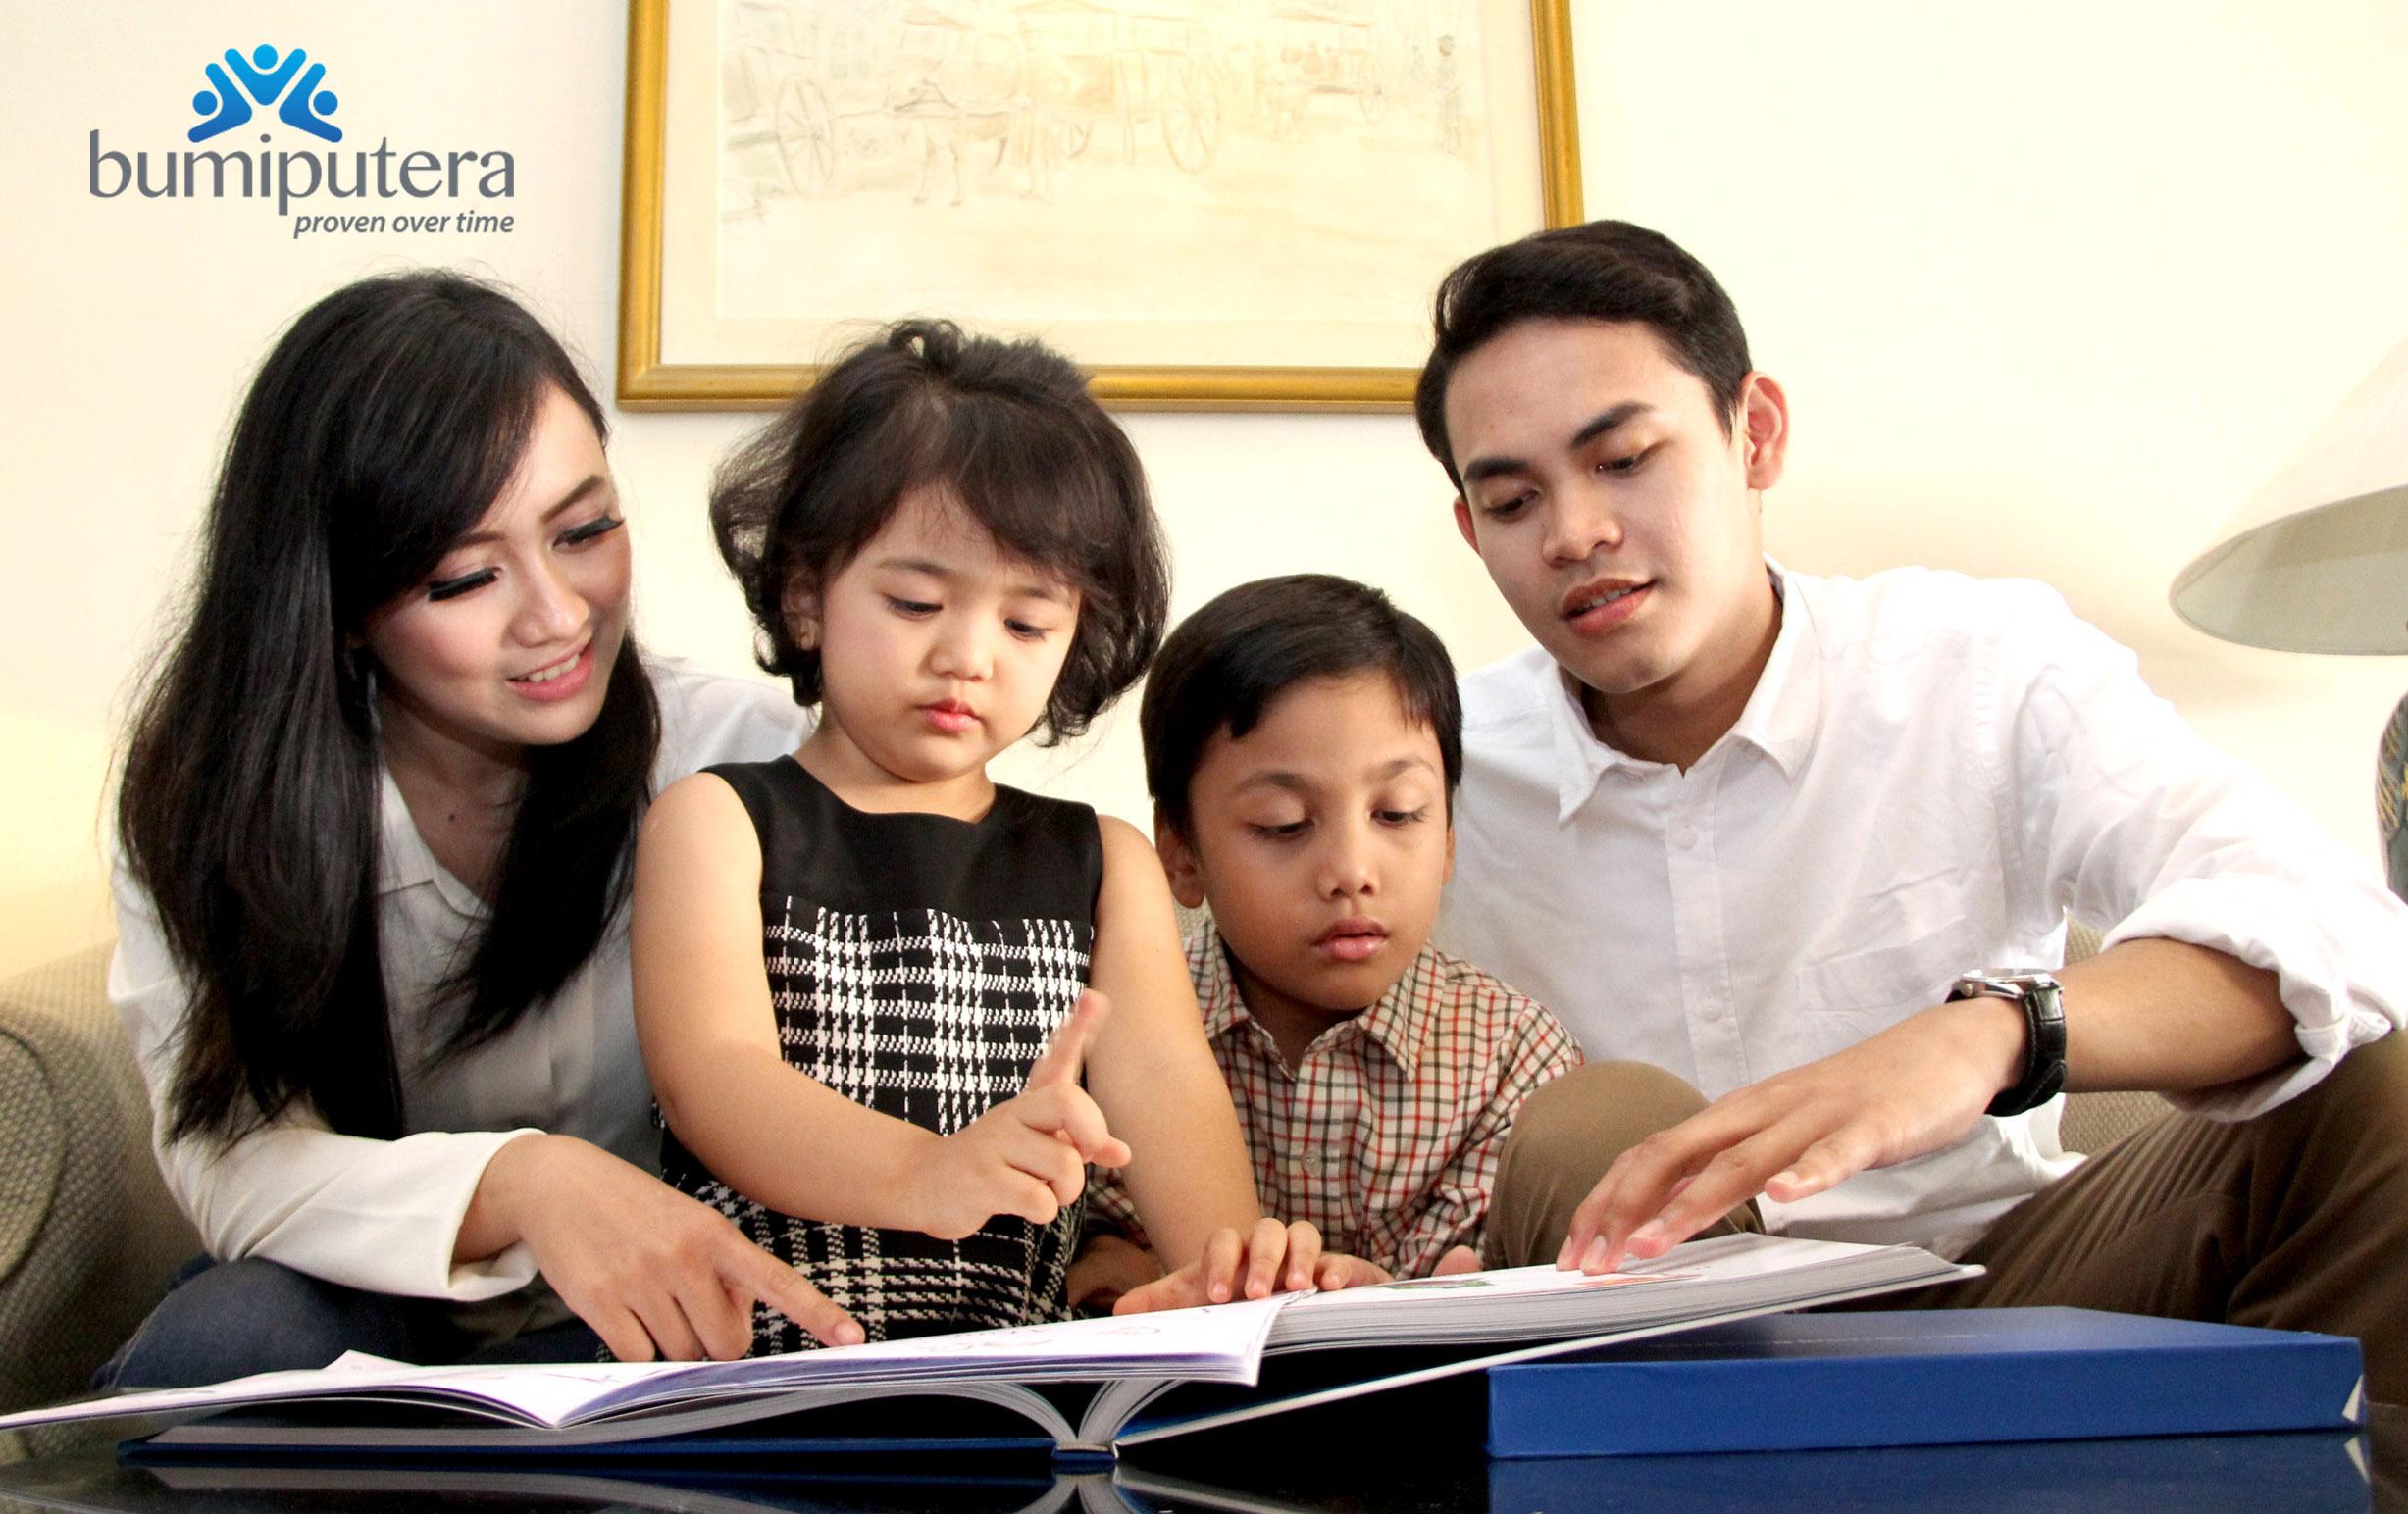 \Asuransi Pendidikan Bumiputera Jamin Masa Depan Anak \